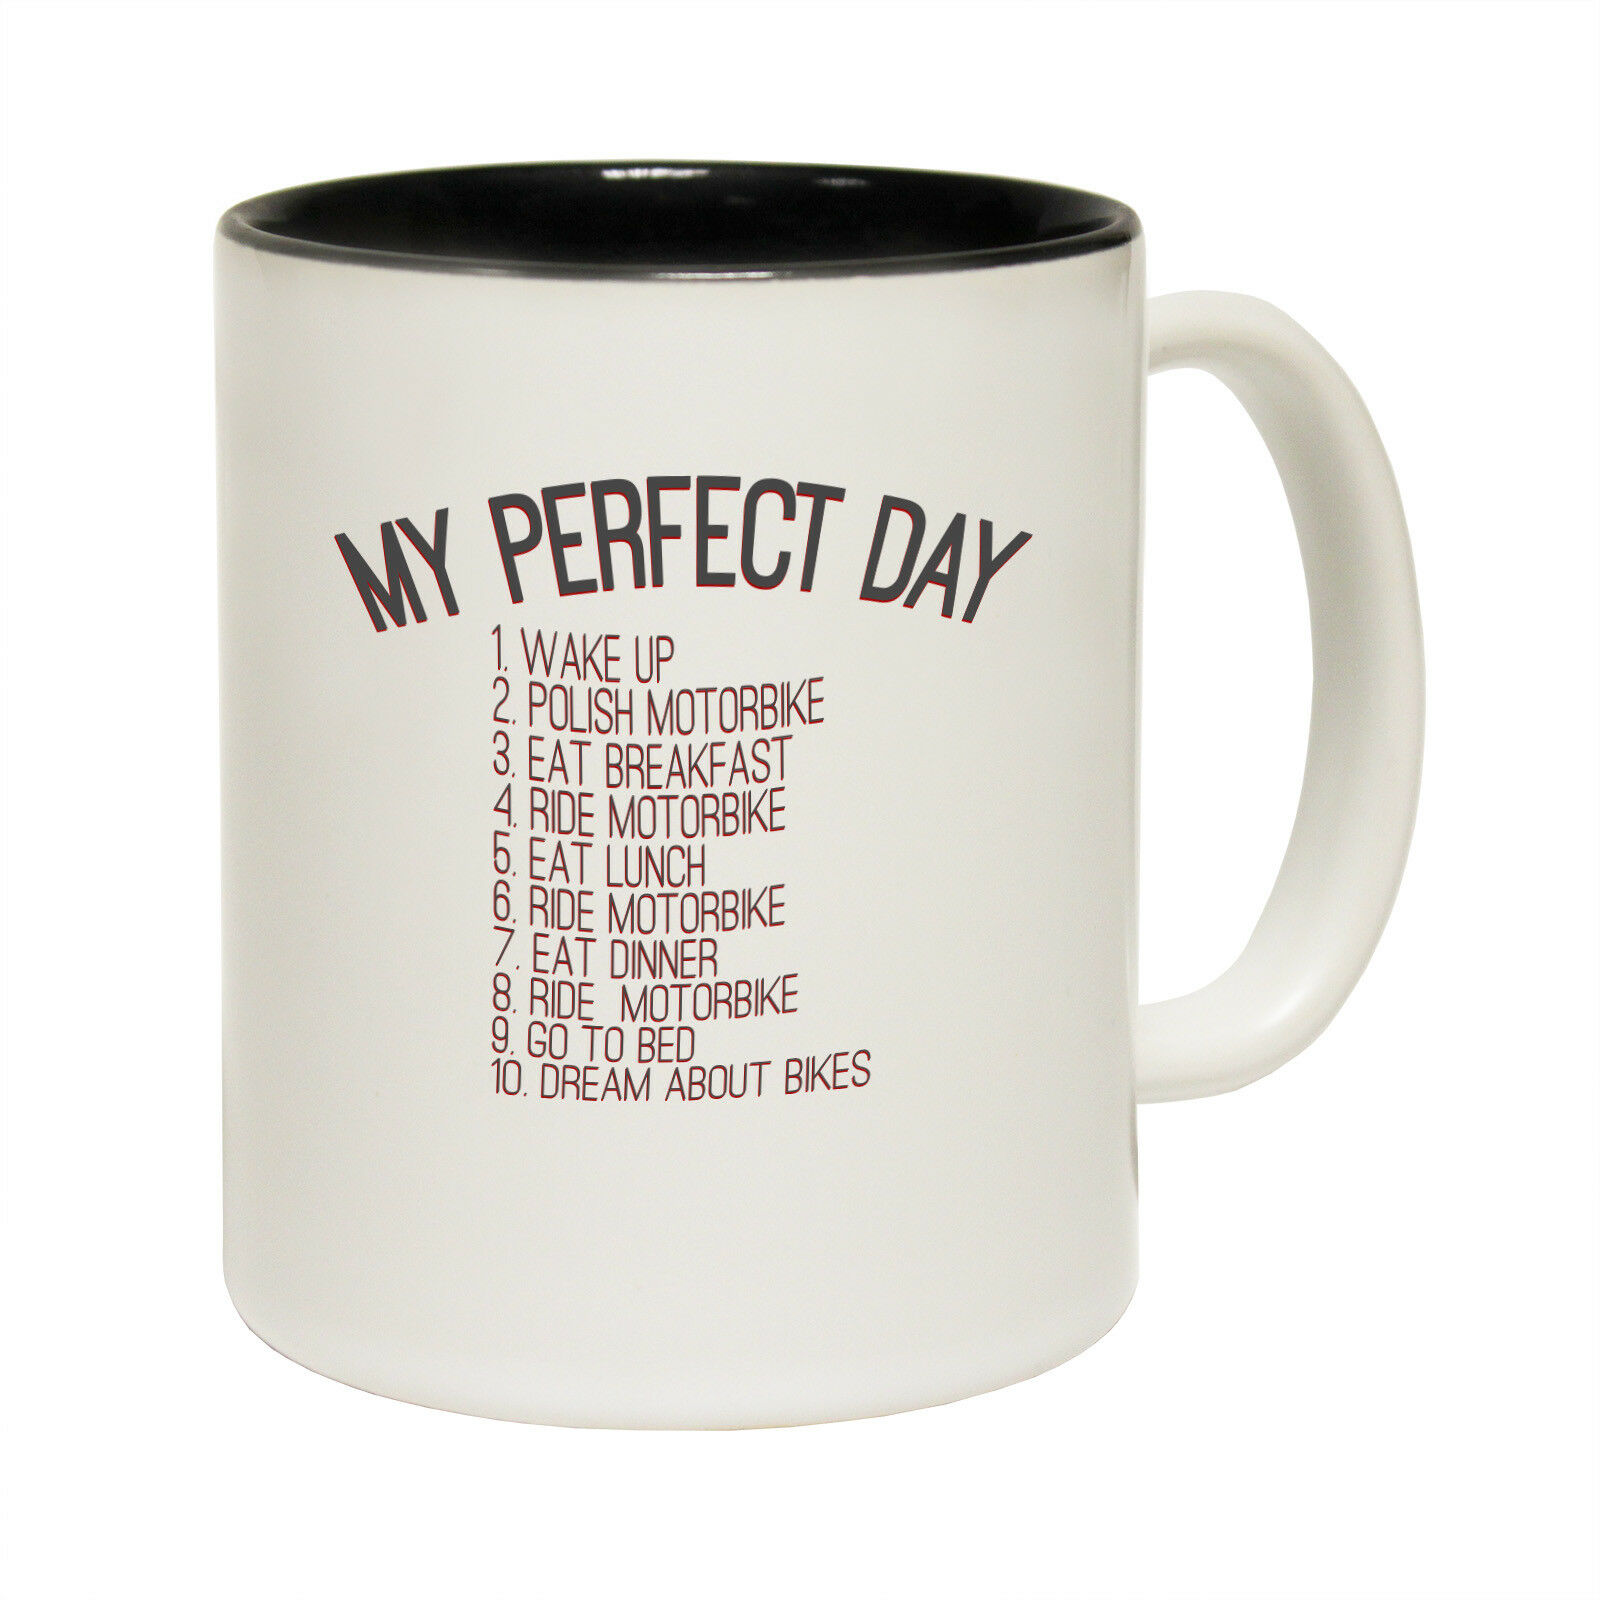 Funny Coffee Mugs Love One Women And Several Motorbikes Gift Giant Novelty Mug Mugs